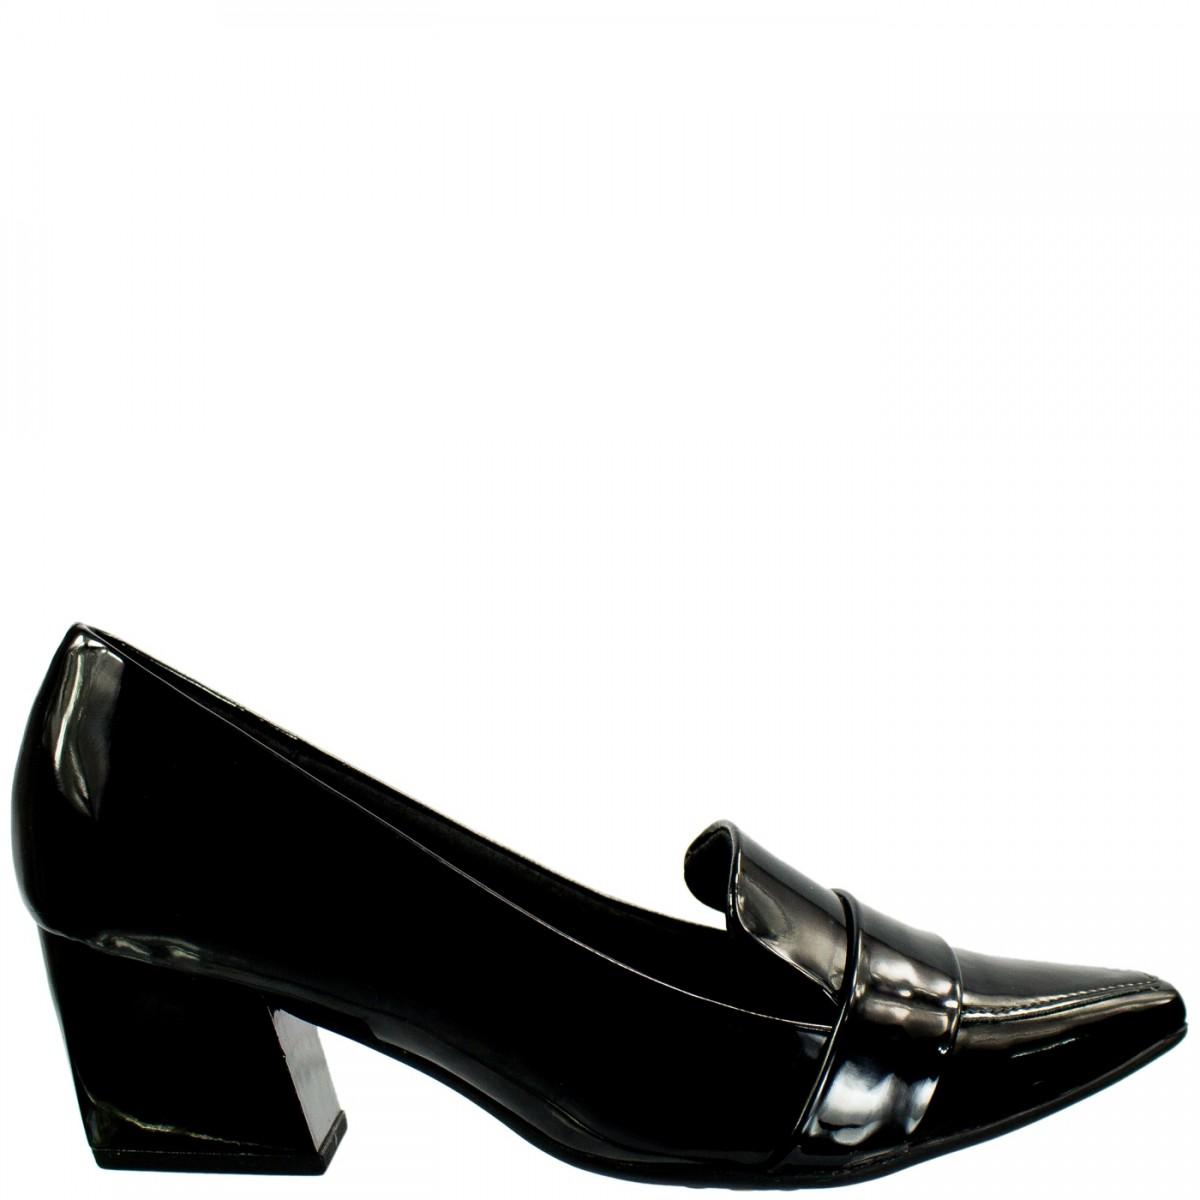 b579cf51b5 Bizz Store - Sapato Scarpin Feminino Piccadilly Verniz Preto